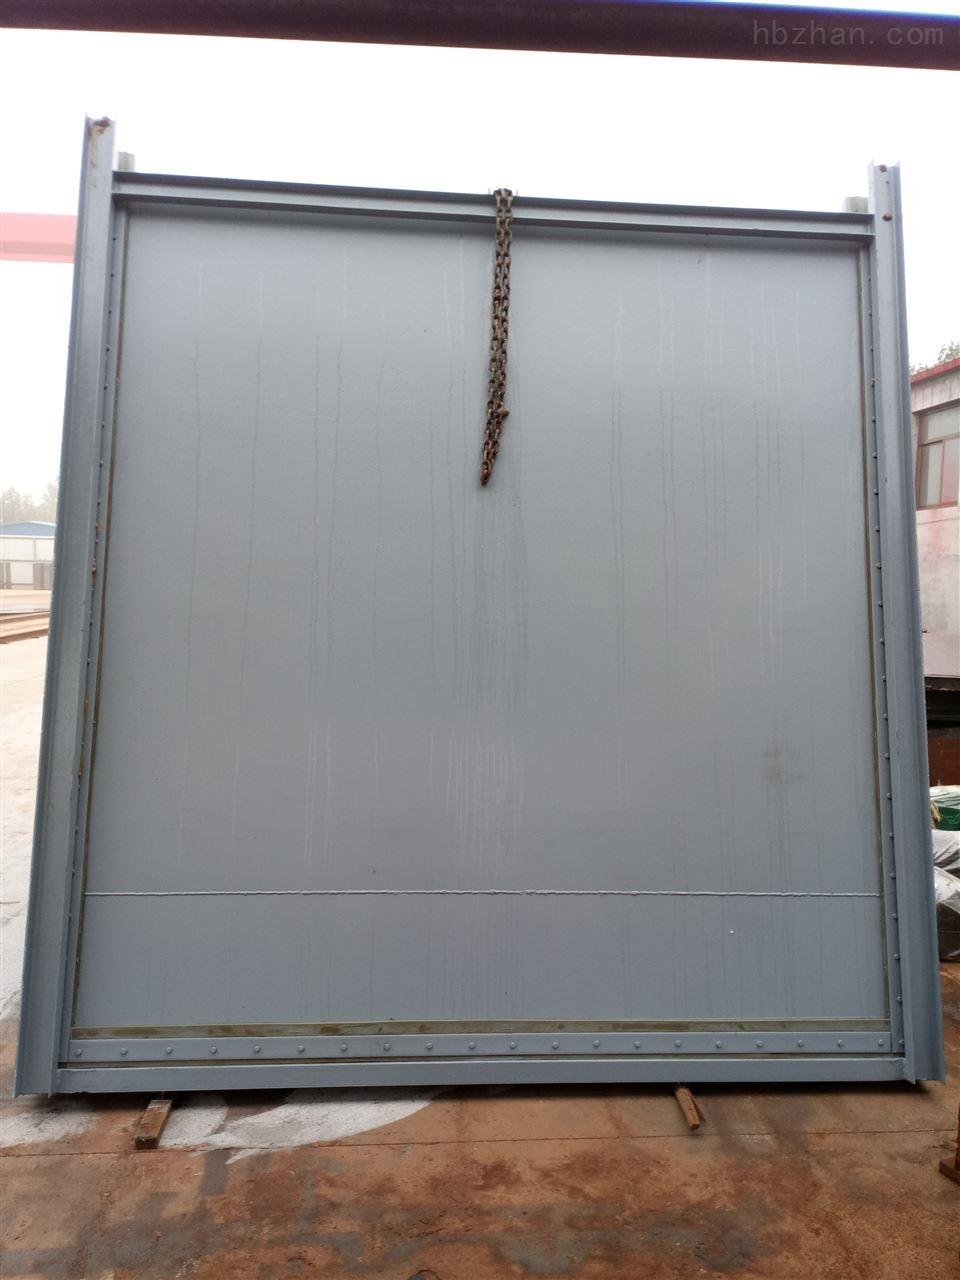 PGZ-世诚泵站用闸门安装方便、价格合理